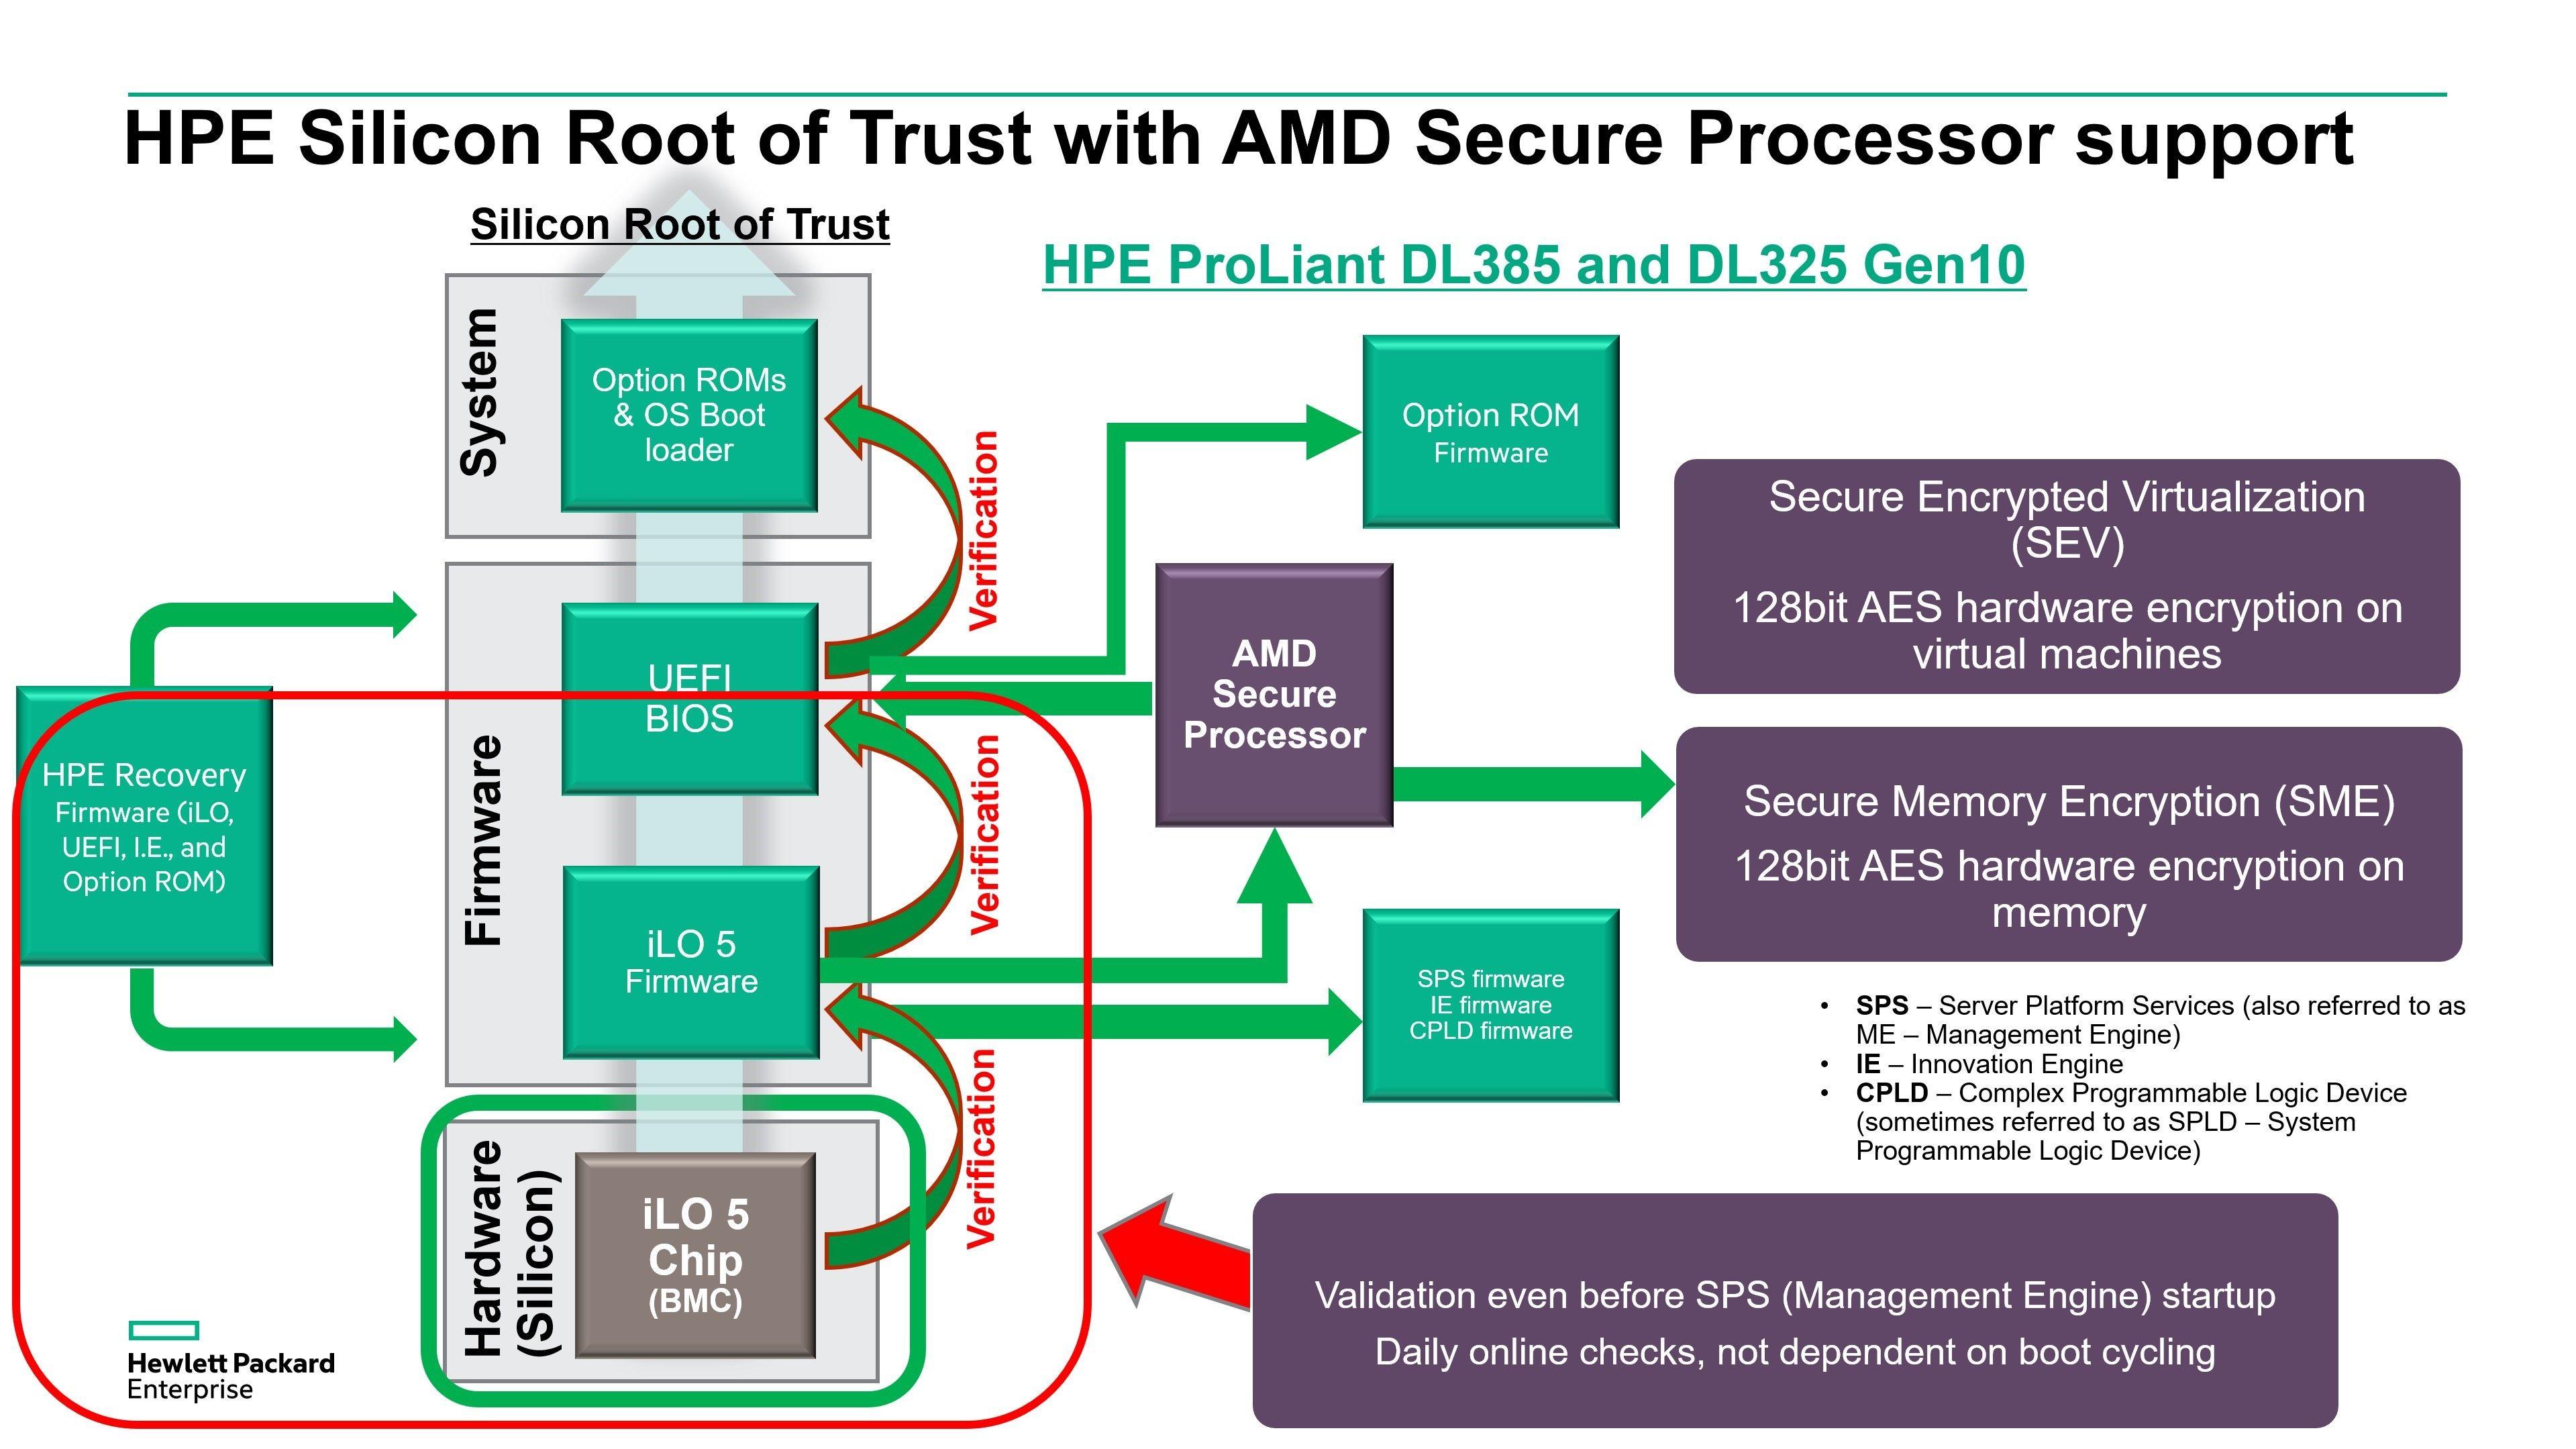 HPE_AMD_3.jpg